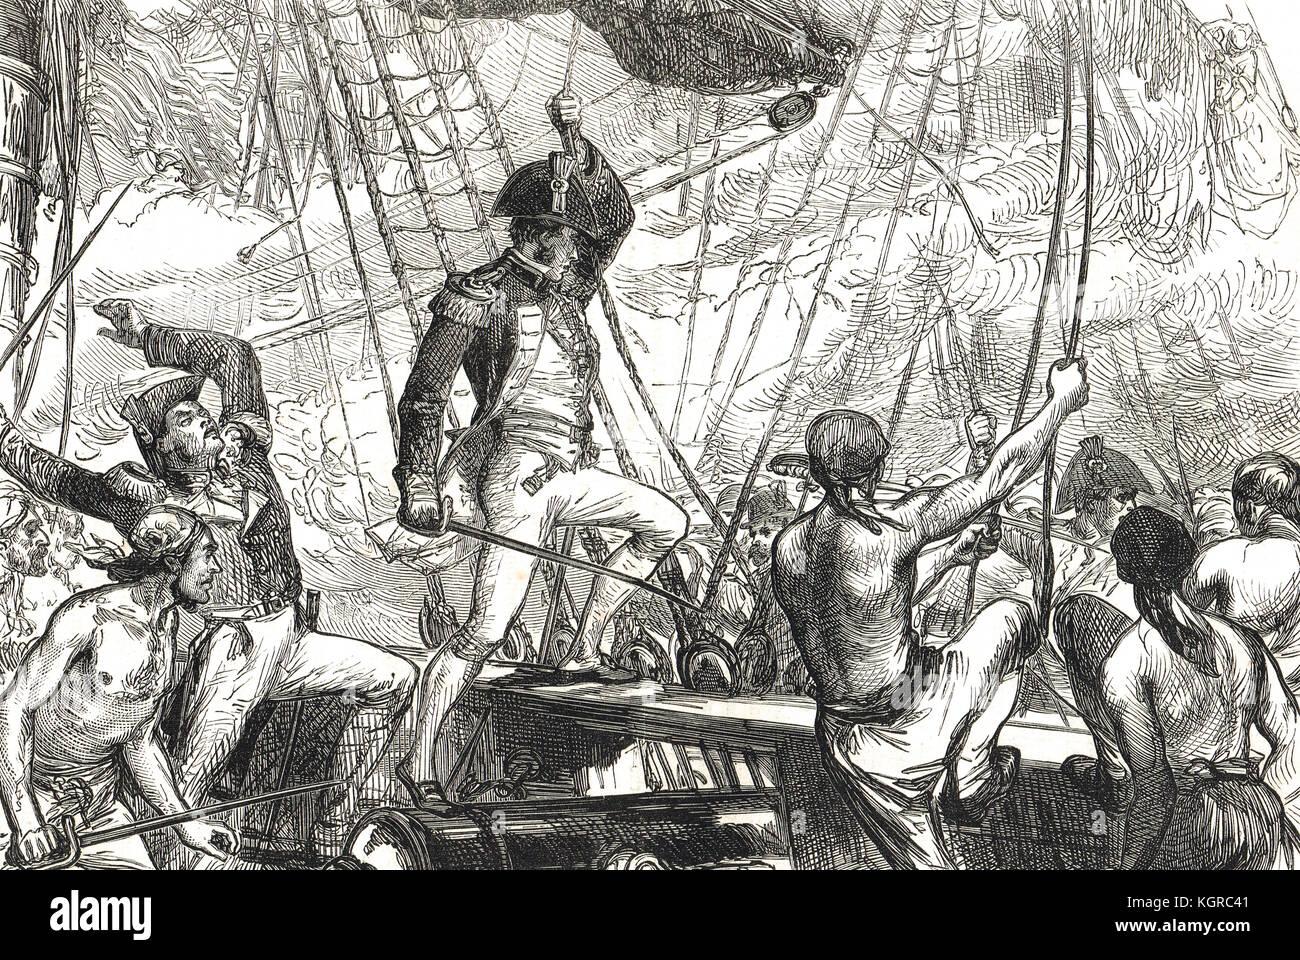 British boarding parties, boarding USS Argus, 14 August 1813, War of 1812 - Stock Image